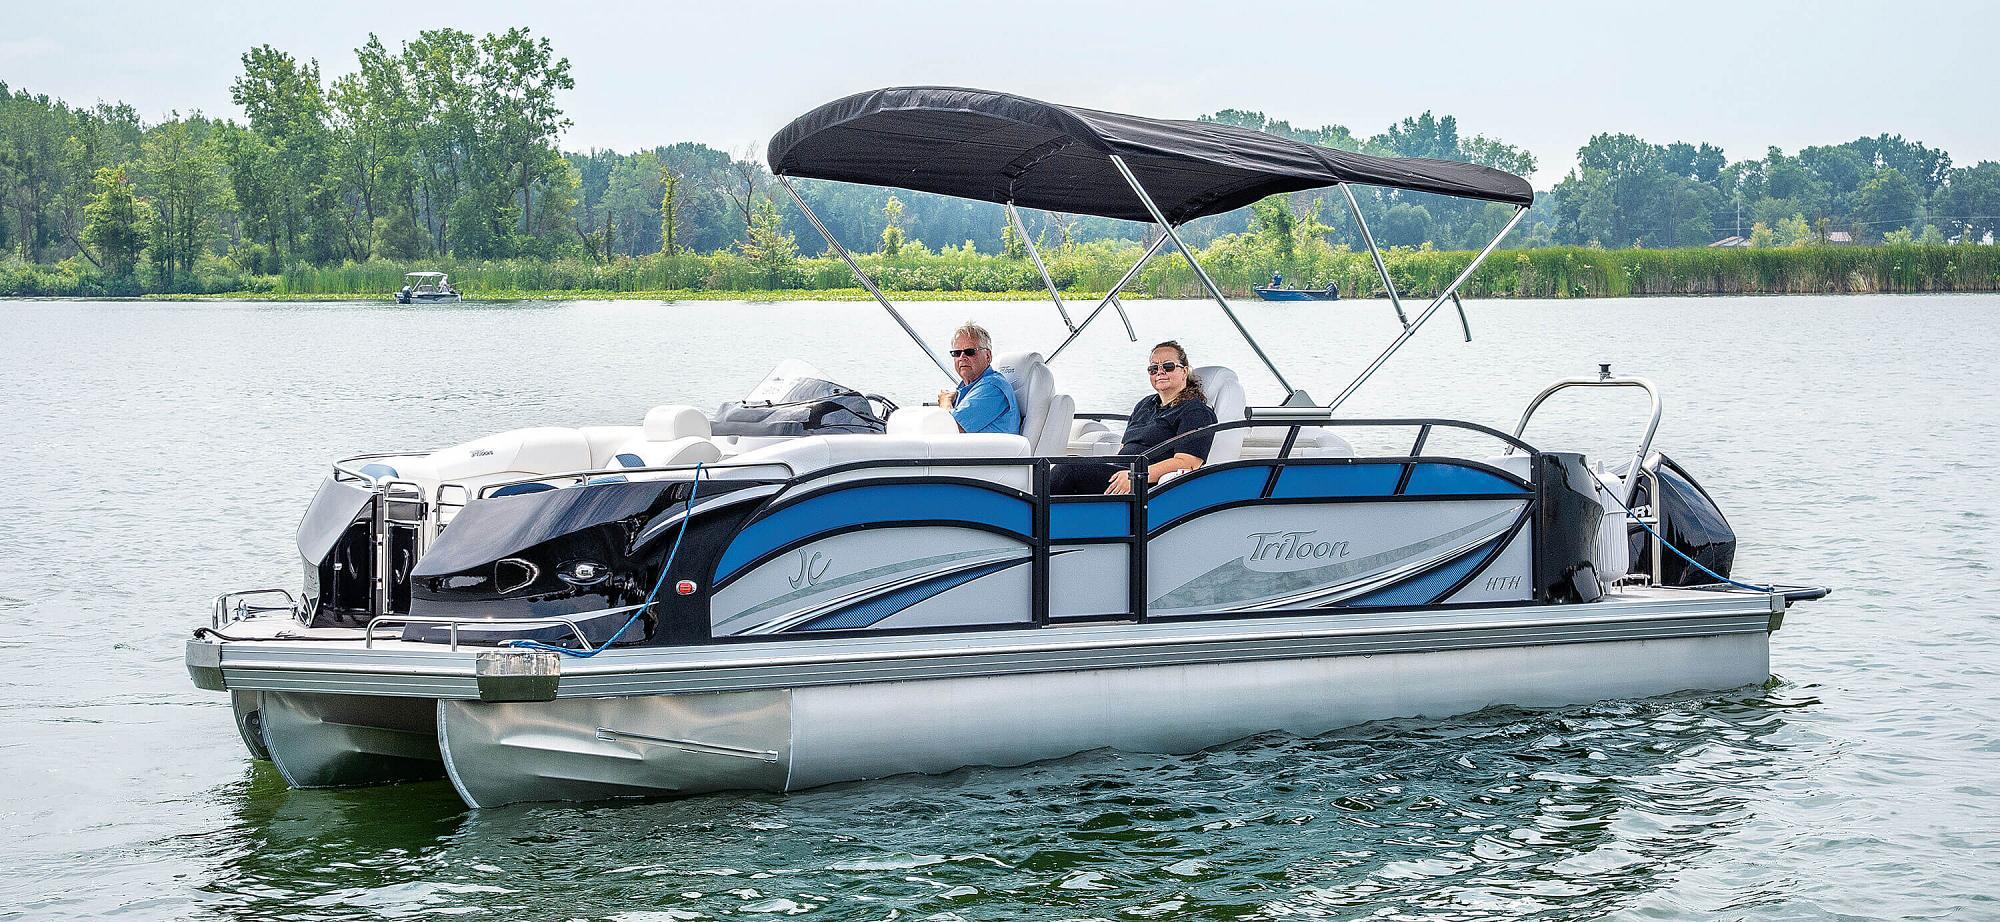 Sporttoon Pontoon Boats Jc Tritoon Marine Boat Electrical Wiring Diagrams Stereo 2019 24tt Hth Main